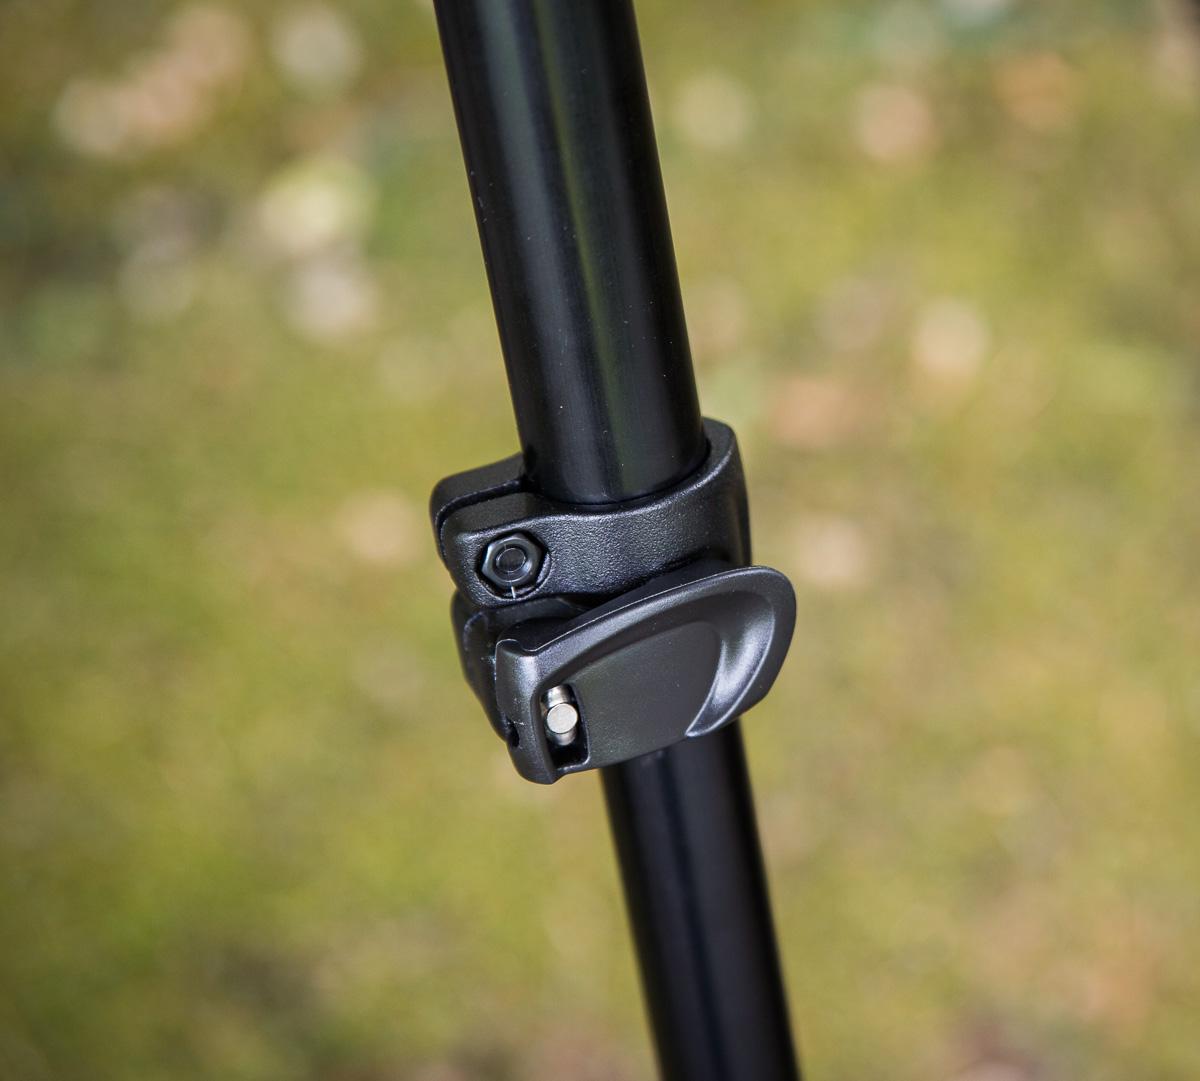 tamron-150-600mm-manfrotto-statiiv-290-xtra-9